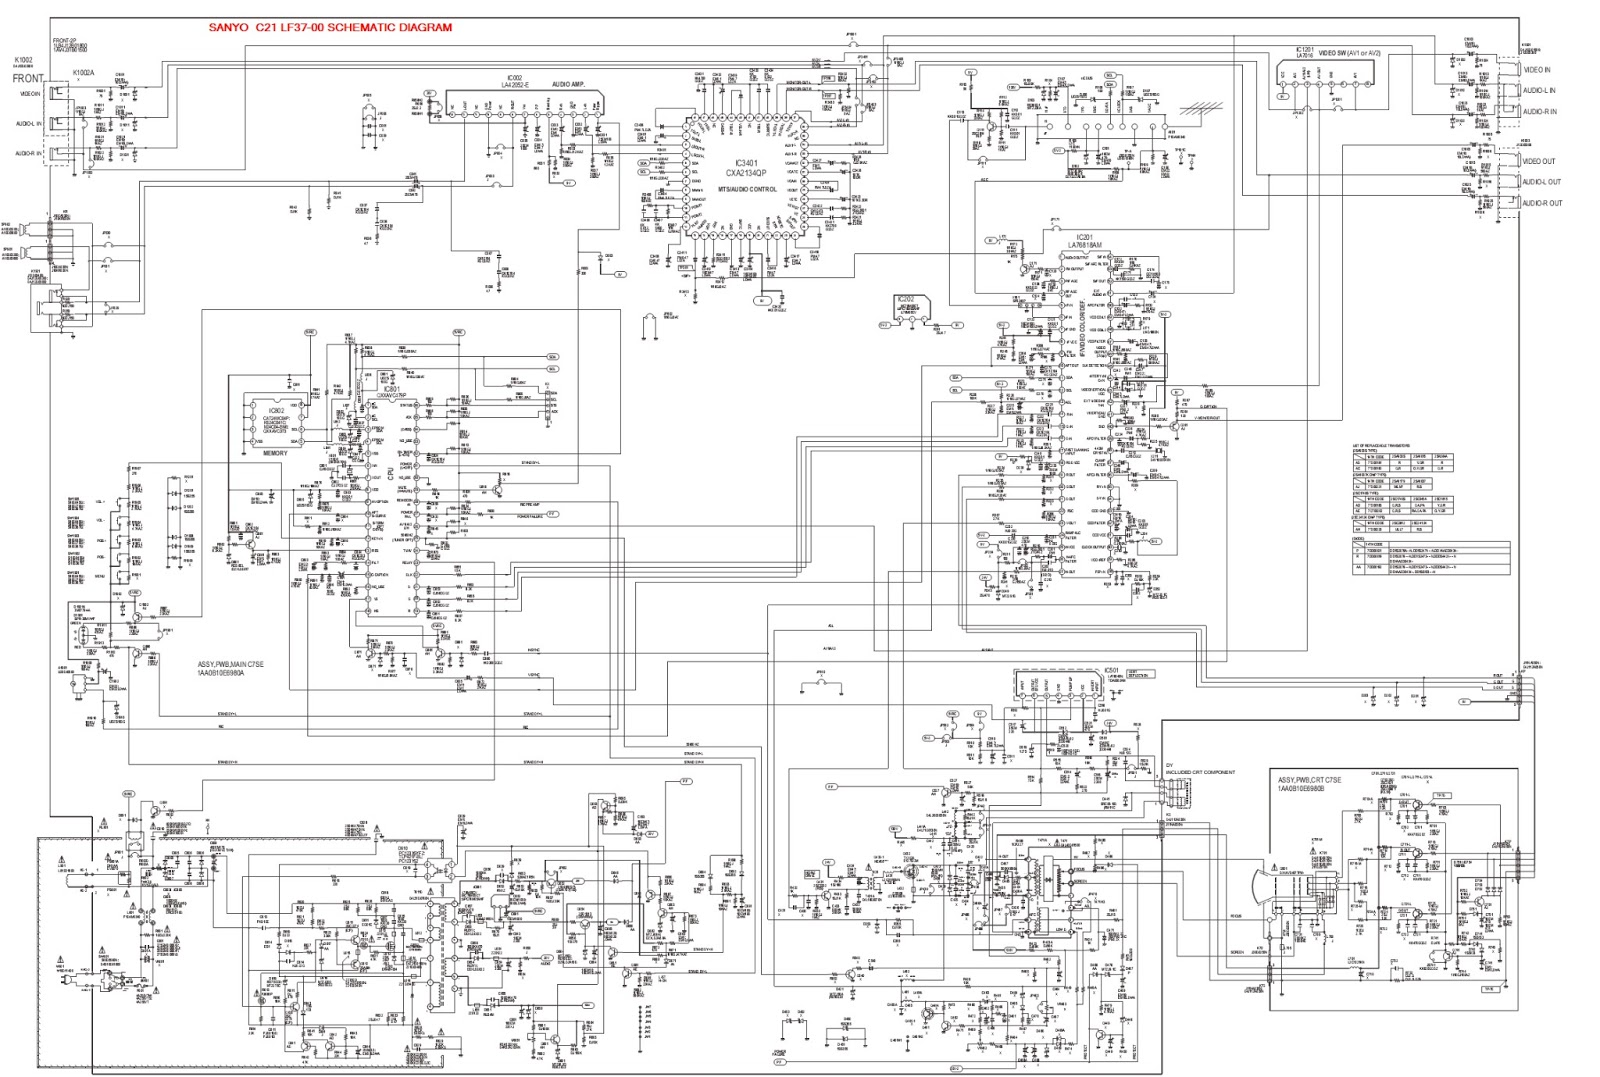 sanyo schematic diagram schematic diagram dp42849 sanyo tv